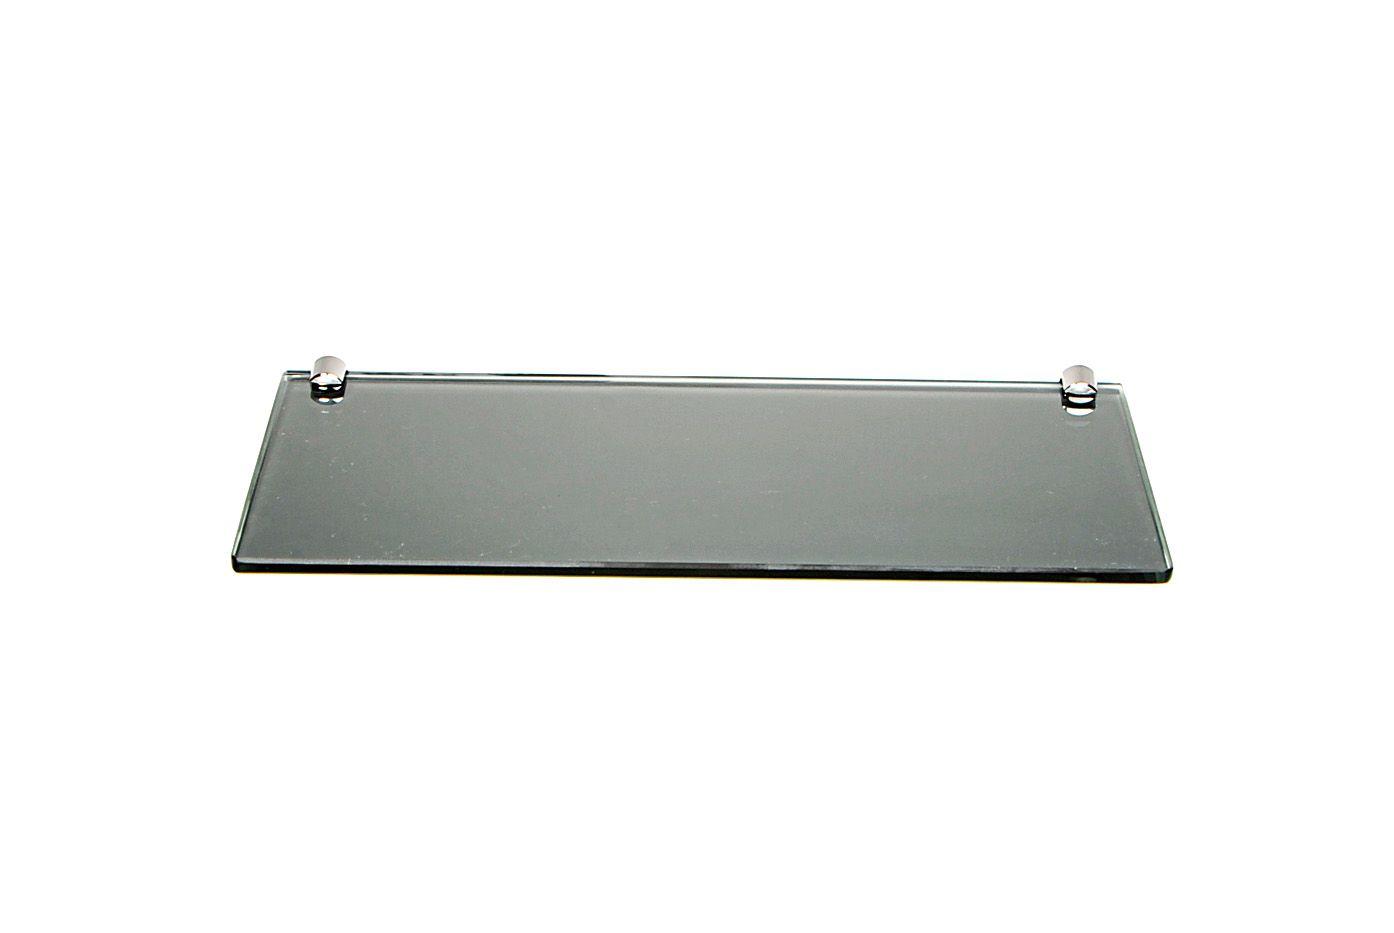 Porta Shampoo Reto em Vidro Refletivo Lapidado- Aquabox  - 40cmx14cmx8mm